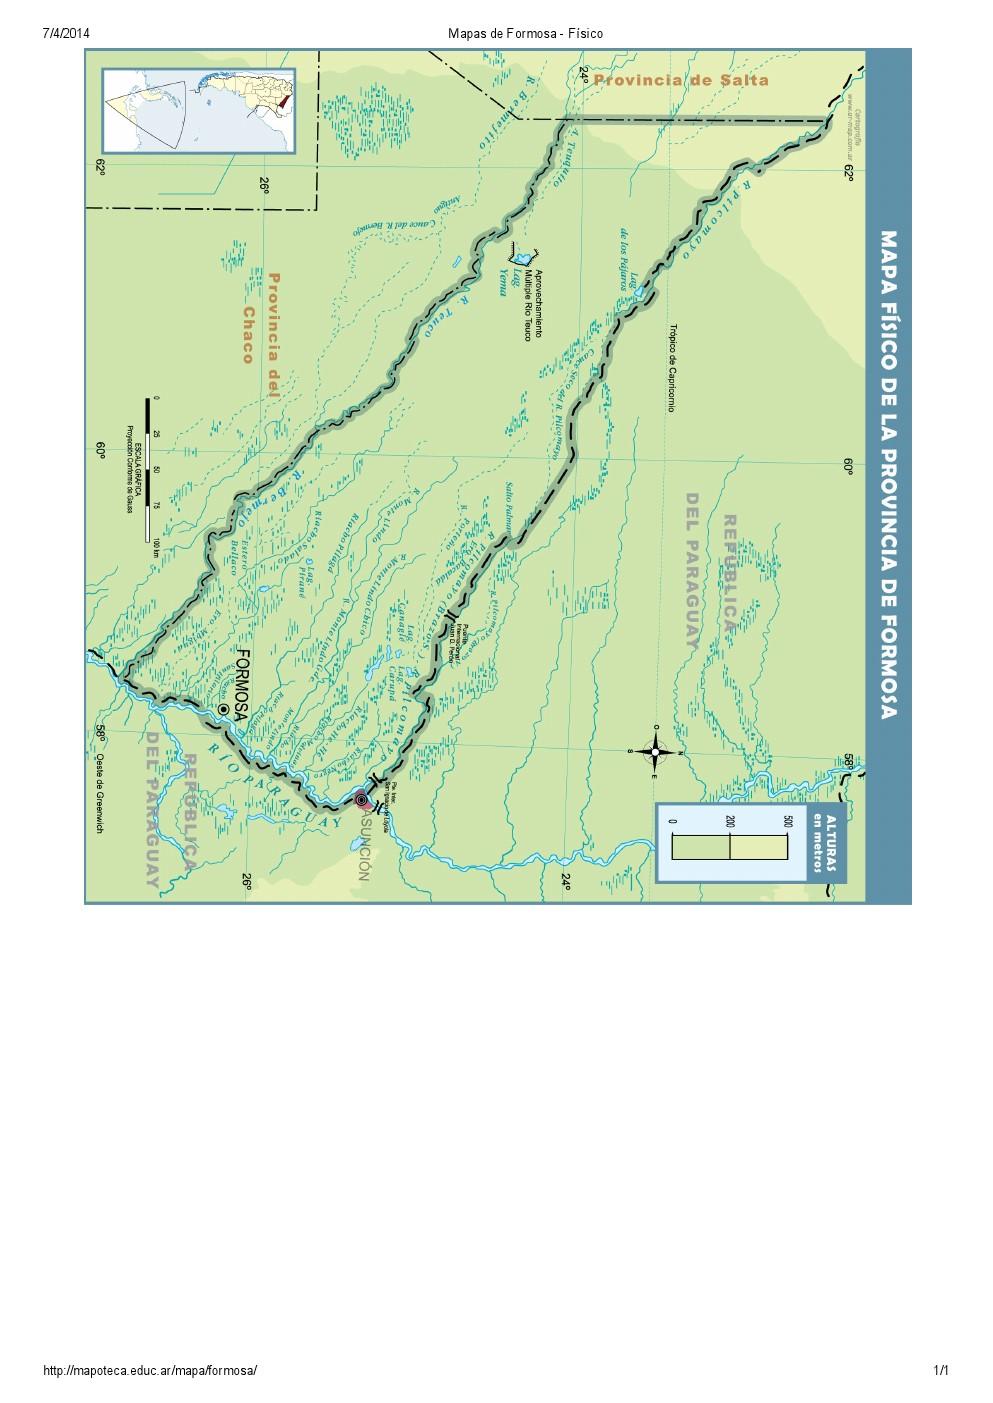 Mapa de ríos de Formosa. Mapoteca de Educ.ar